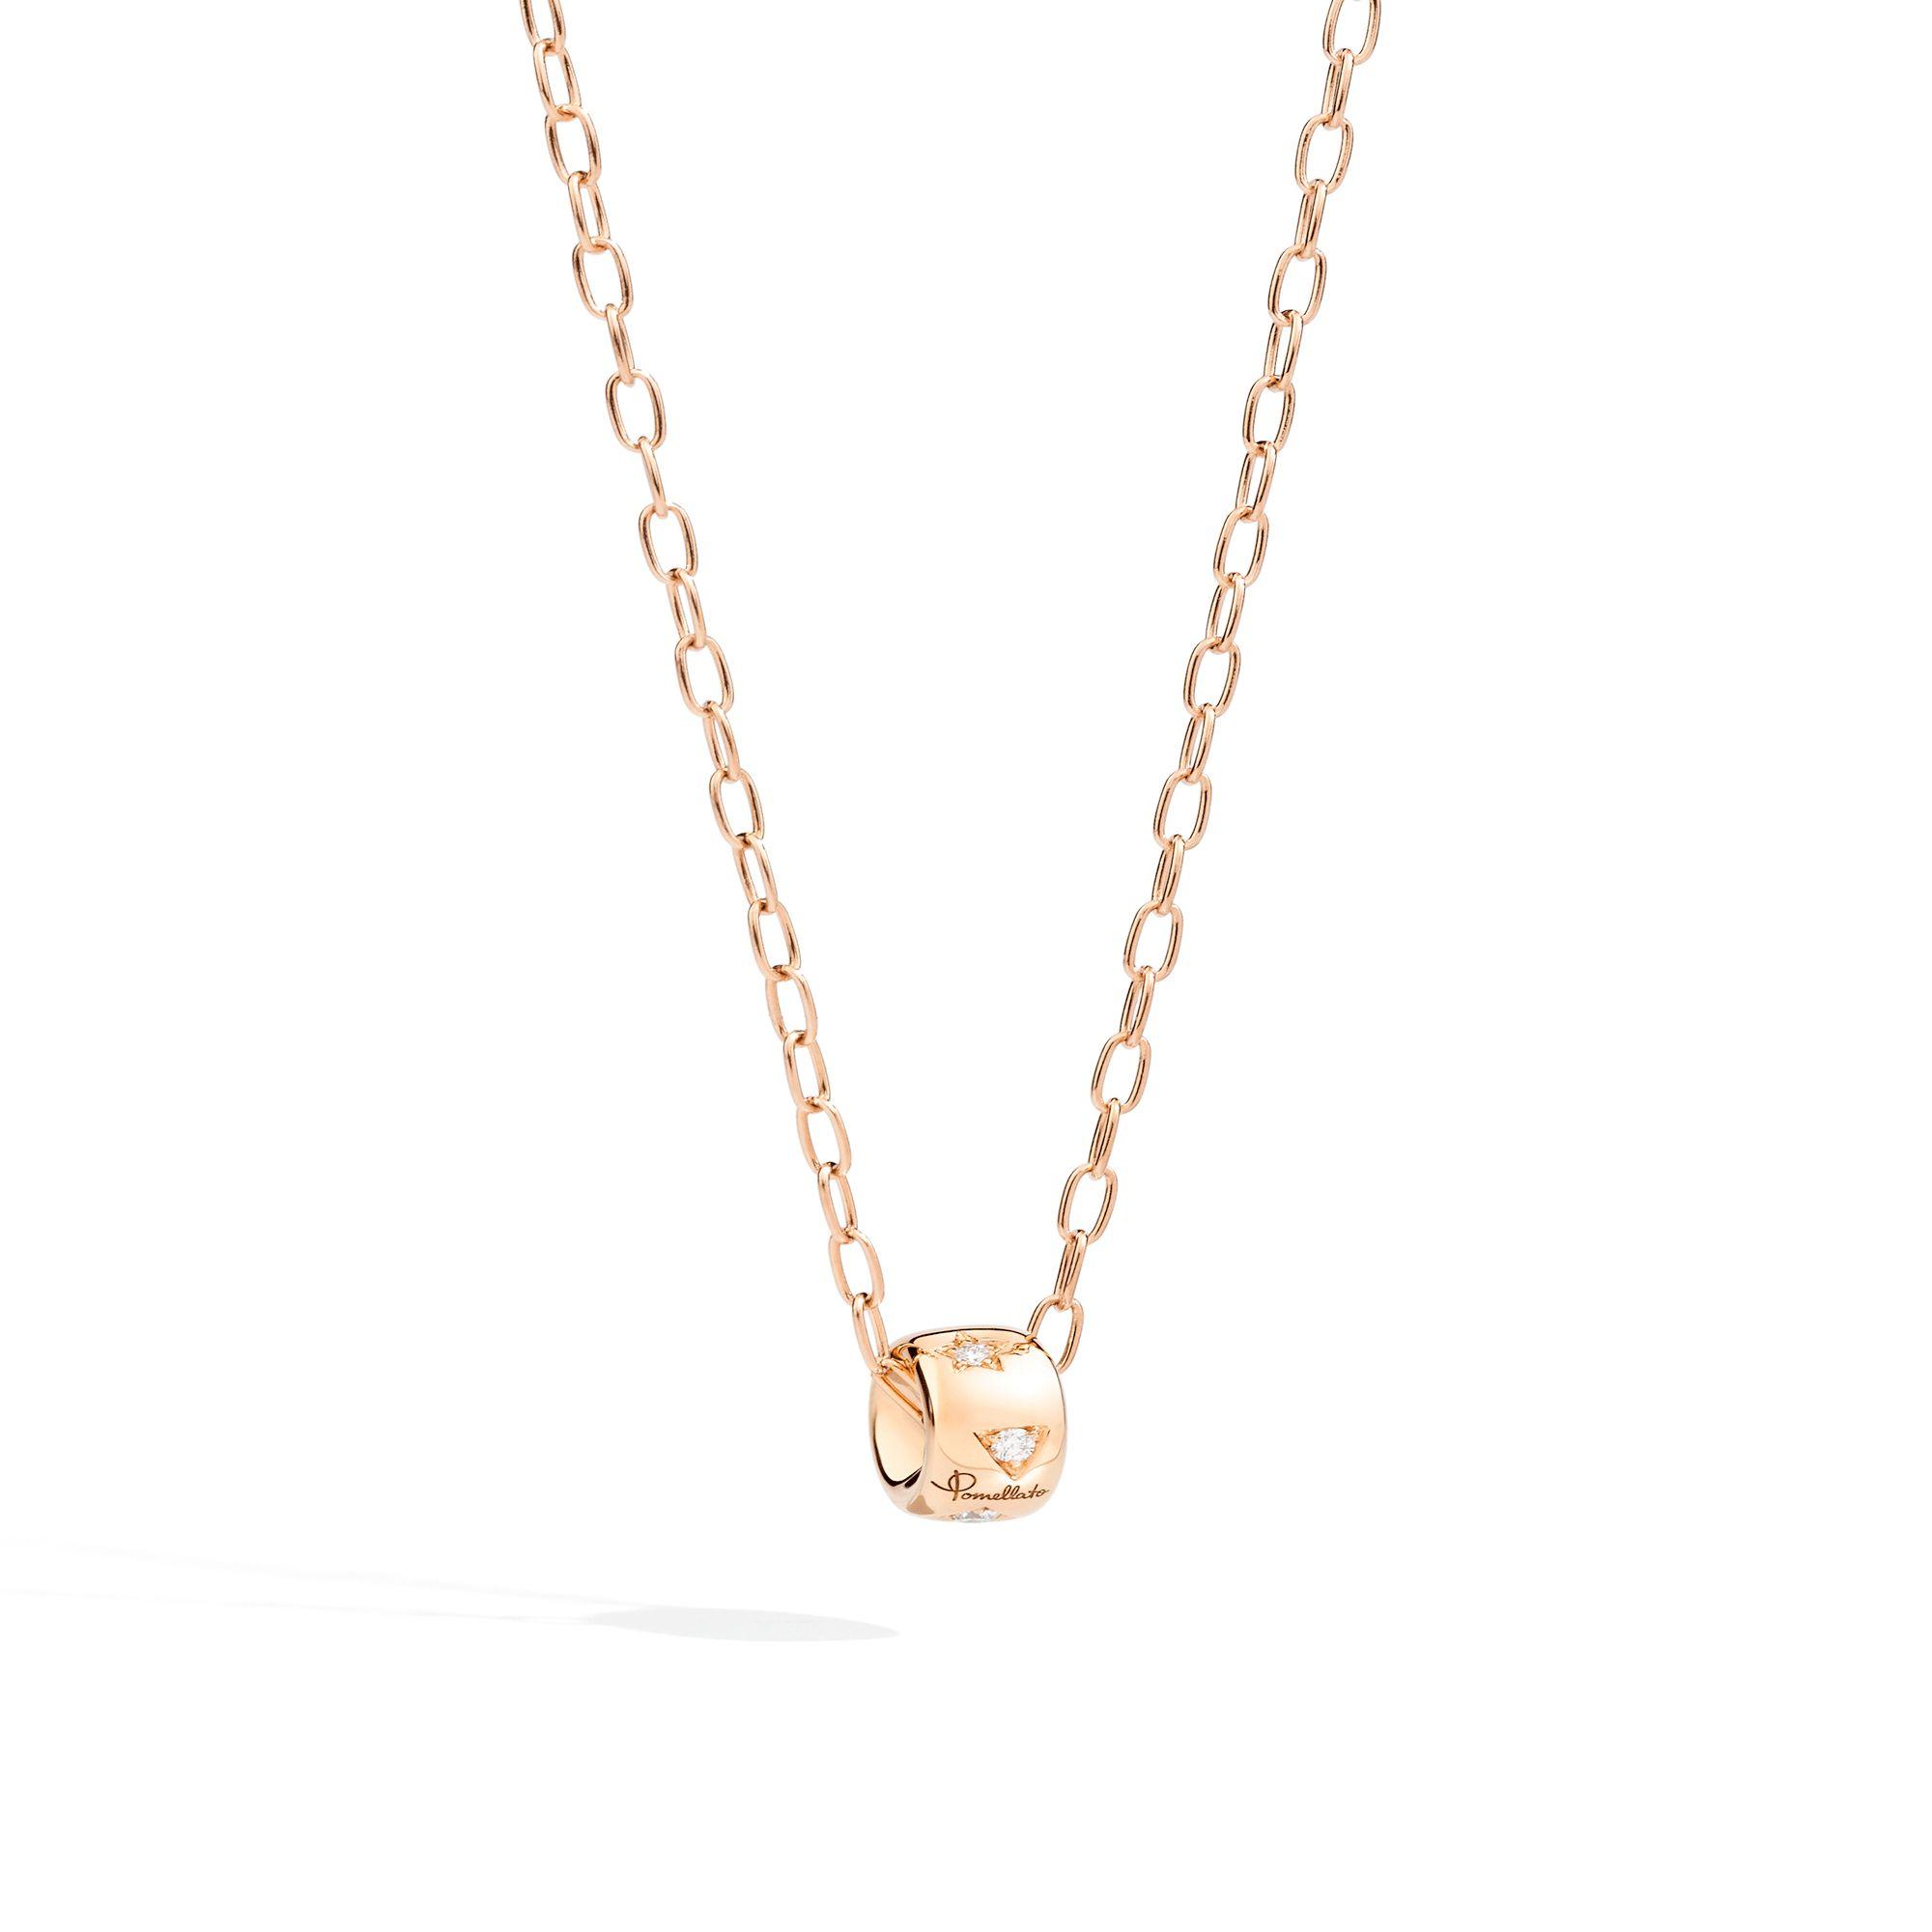 Pendentif Pomellato Iconica en or rose et diamants